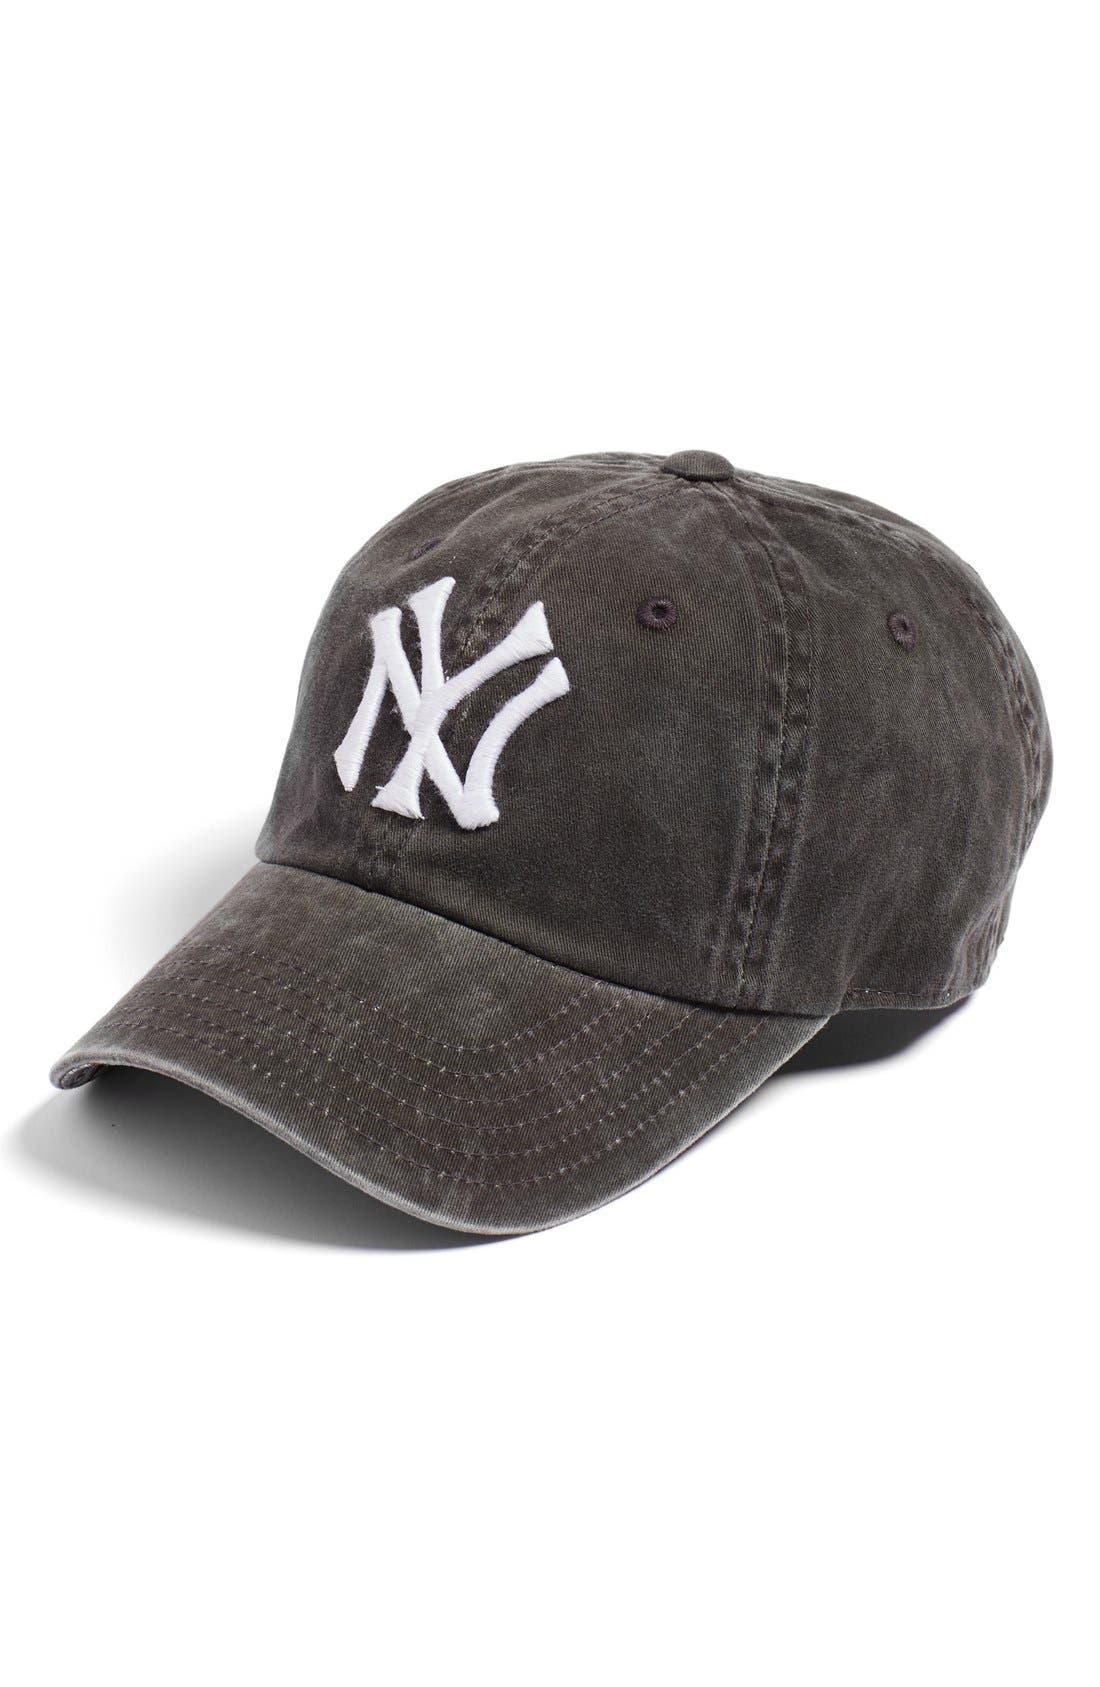 AMERICAN NEEDLE New Raglan New York Yankees Baseball